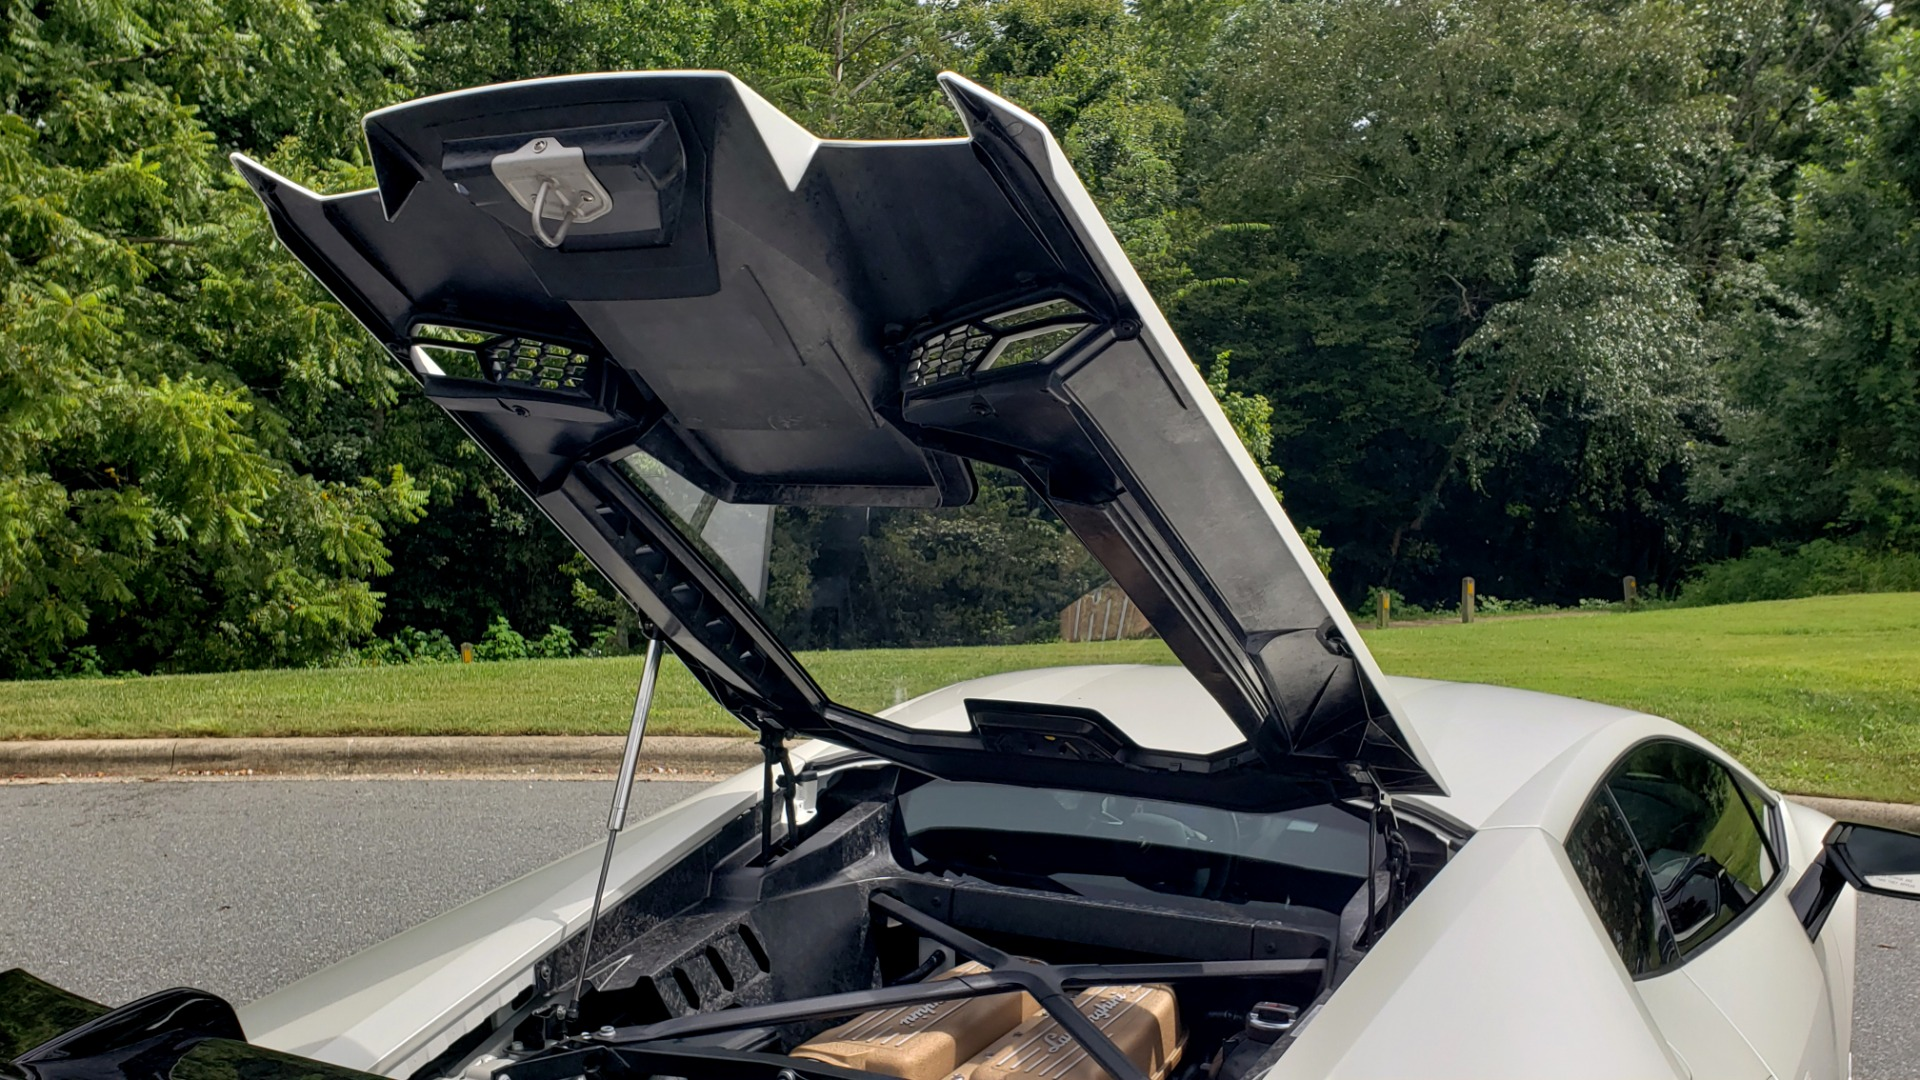 Used 2018 Lamborghini HURACAN PERFORMANTE 5.2L V10 / 630HP / 7-SPD AUTO / AWD / NAV / PREM SND for sale $269,995 at Formula Imports in Charlotte NC 28227 31